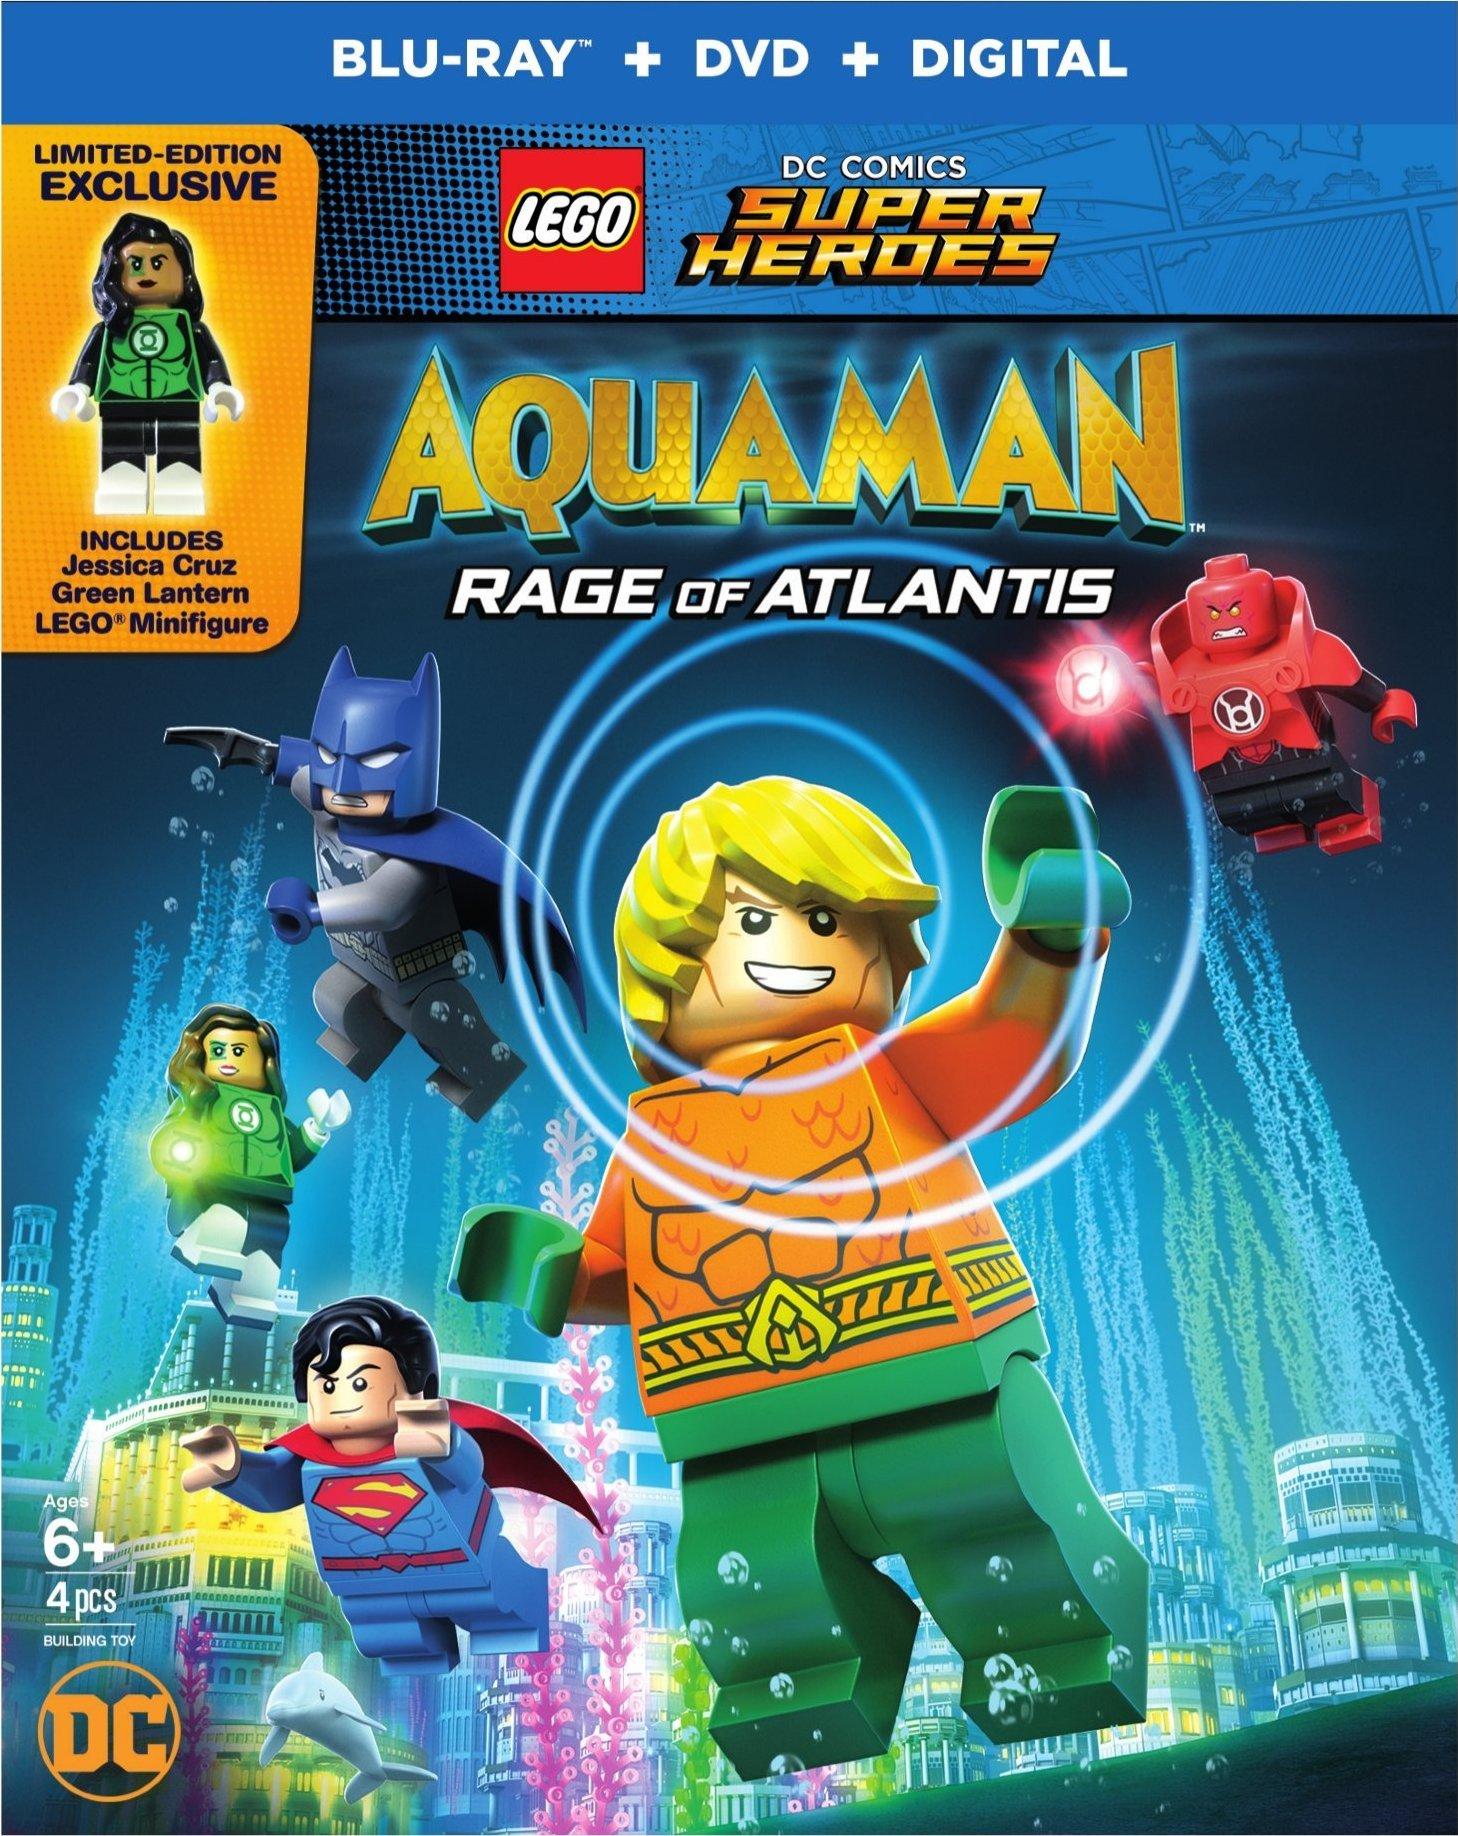 LEGO DC Super Heroes: Aquaman: Rage of Atlantis (2018) Blu-ray